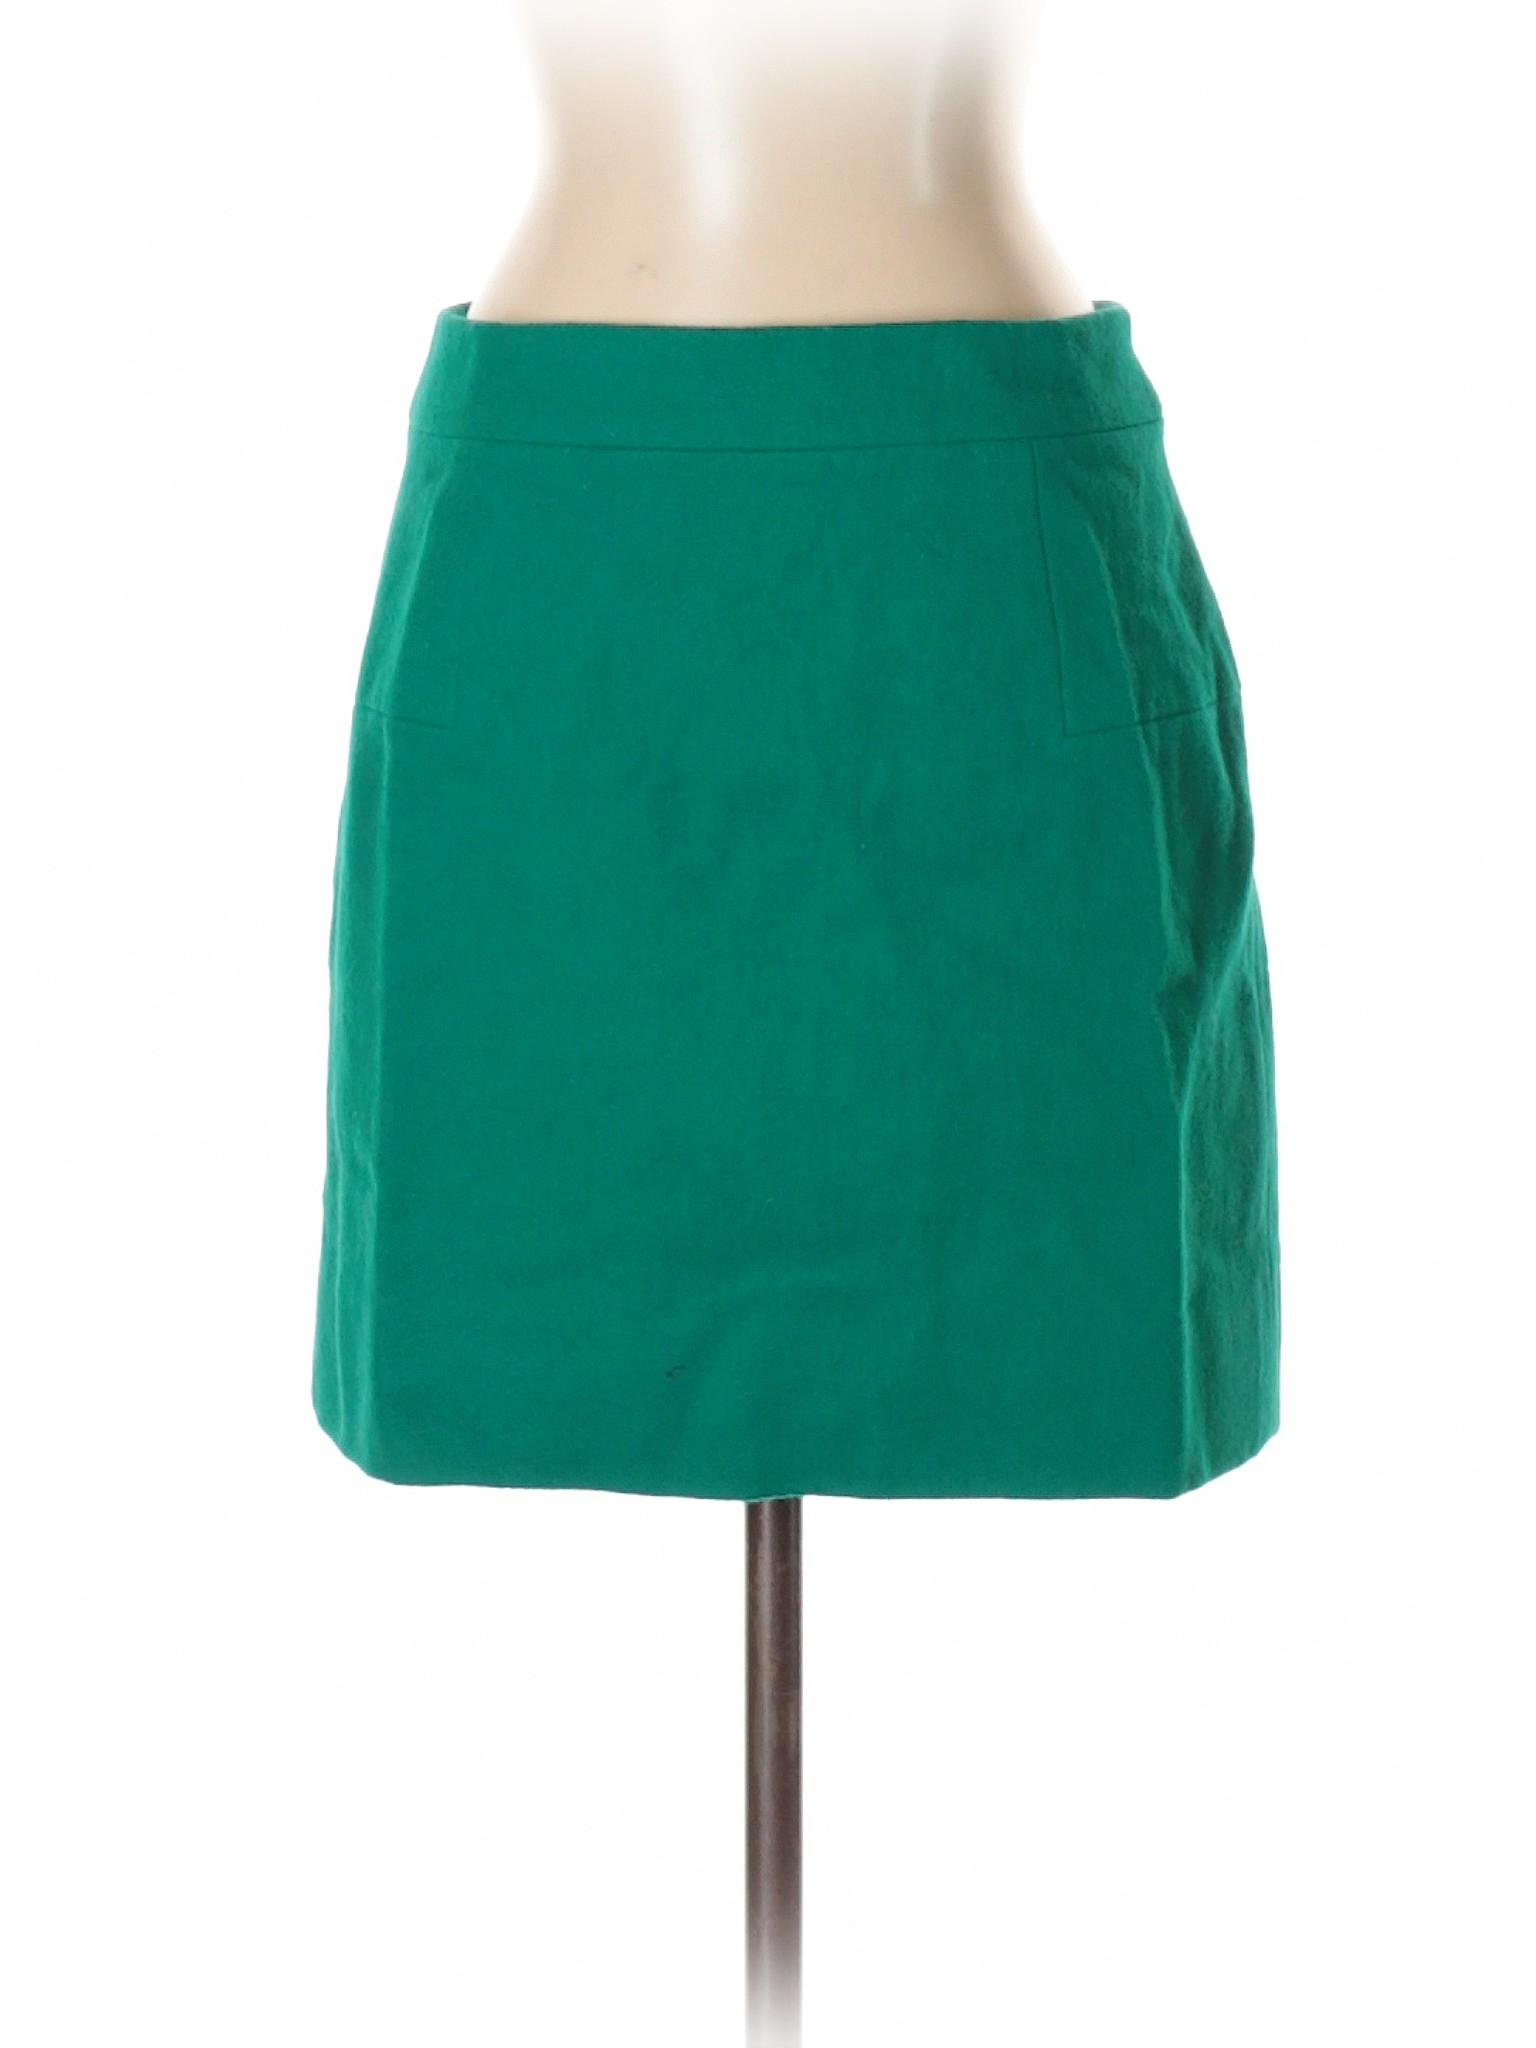 Wool Skirt Wool Wool Wool Boutique Boutique Boutique Boutique Skirt Skirt A6wzOxq78